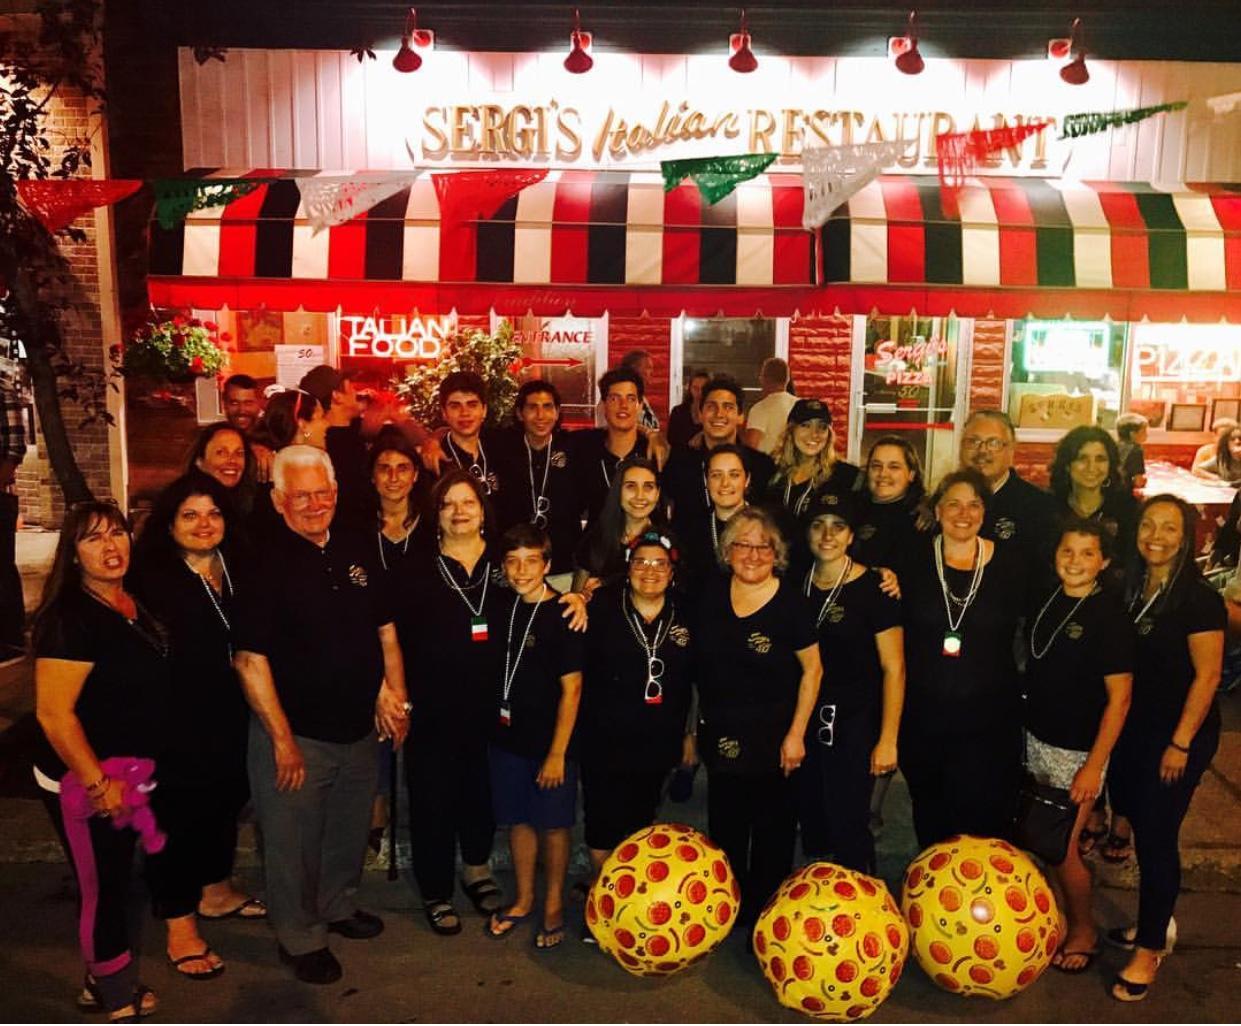 Sergi's Italian Restaurant,  Pizzeria & Banquet Hall image 1